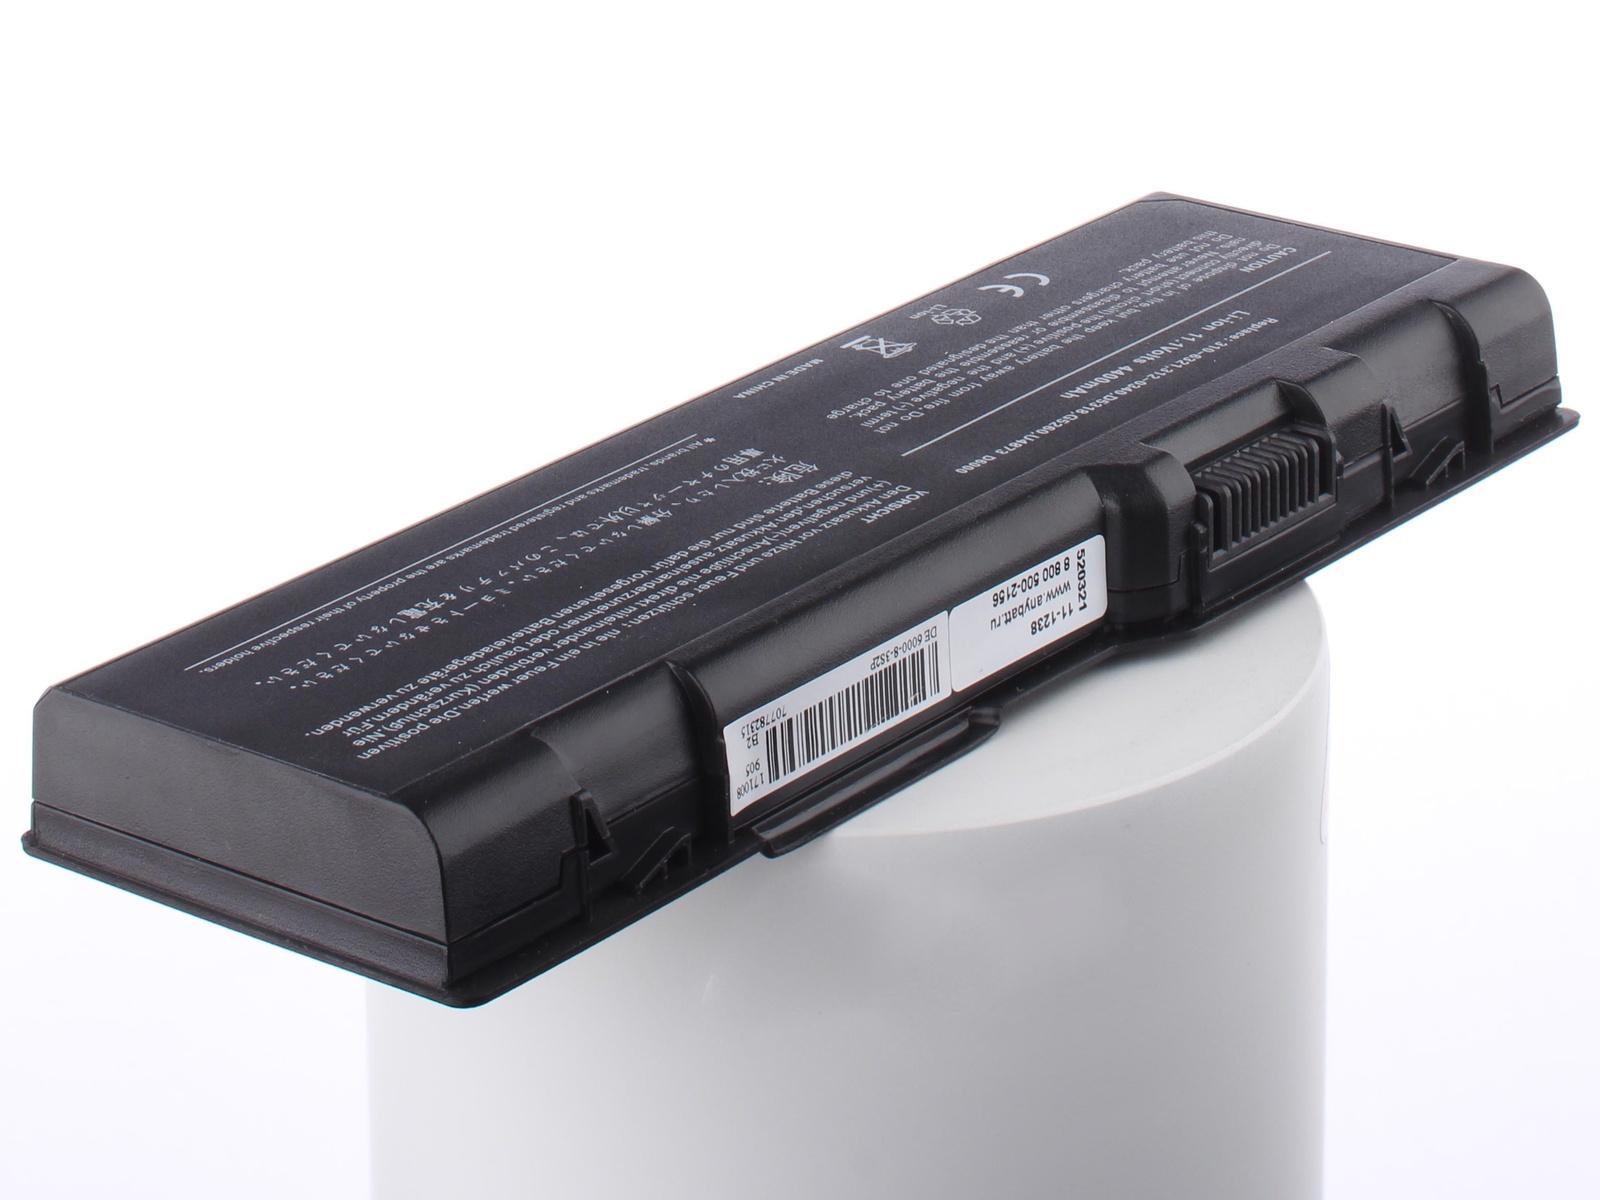 Аккумуляторная батарея AnyBatt 11-A1-1238 4400mAh для ноутбуков Dell D5318, G5260, F5132, U4873, C5974, B-5022, C5447, 312-0349, G5266, цена в Москве и Питере